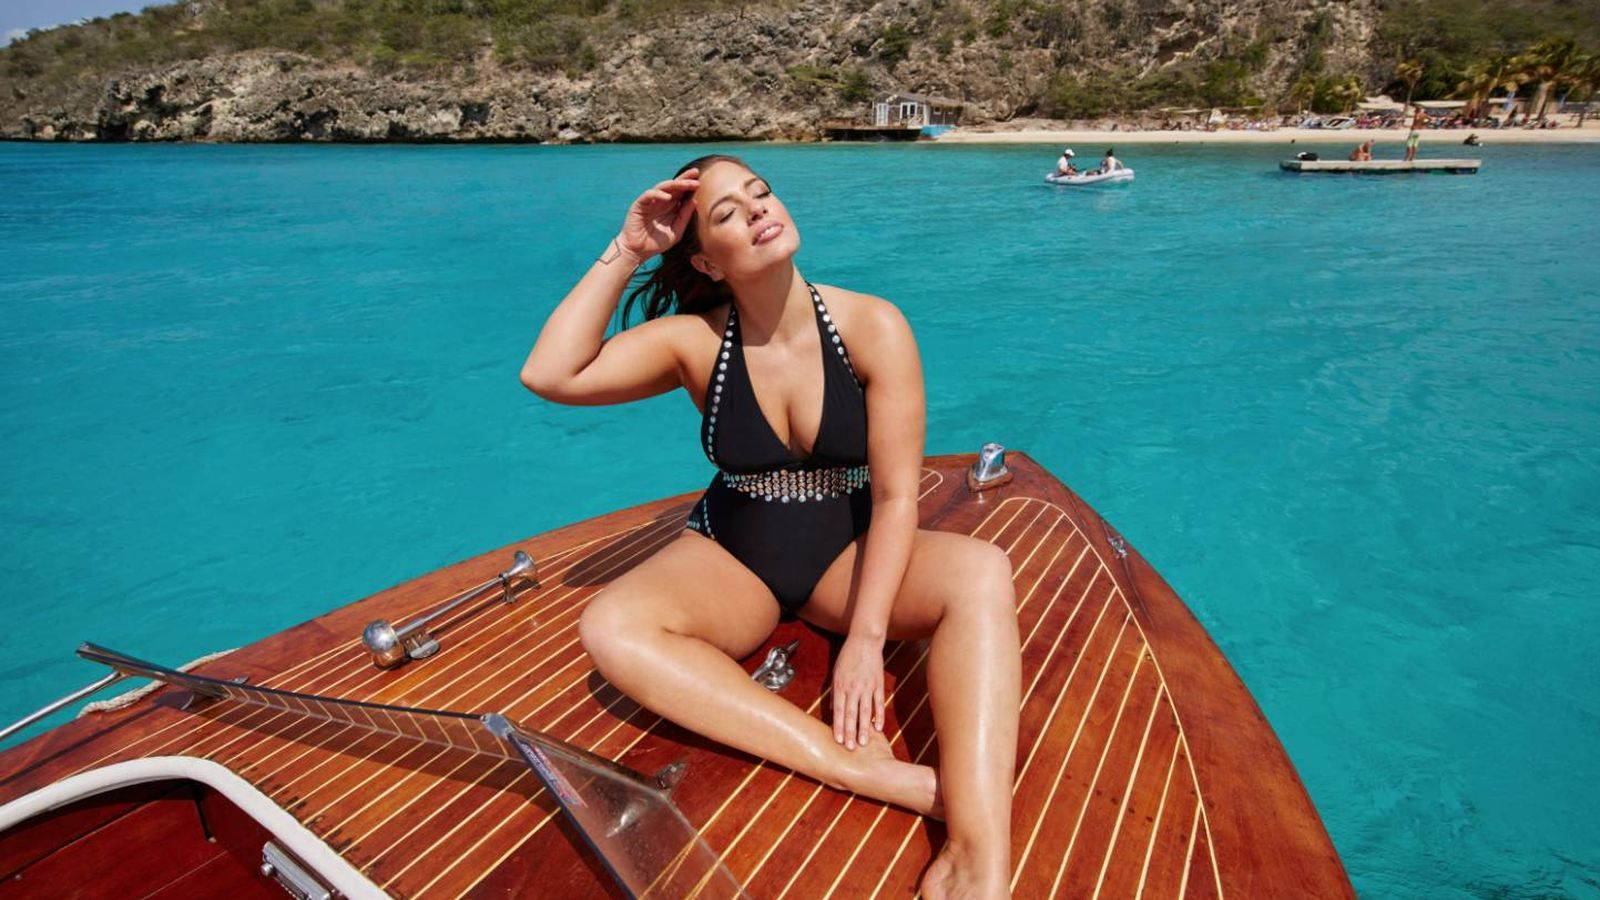 Foto: La modelo Ashley Graham como imagen de su propia firma de bañadores. (Imagen: Swimsuits For All)